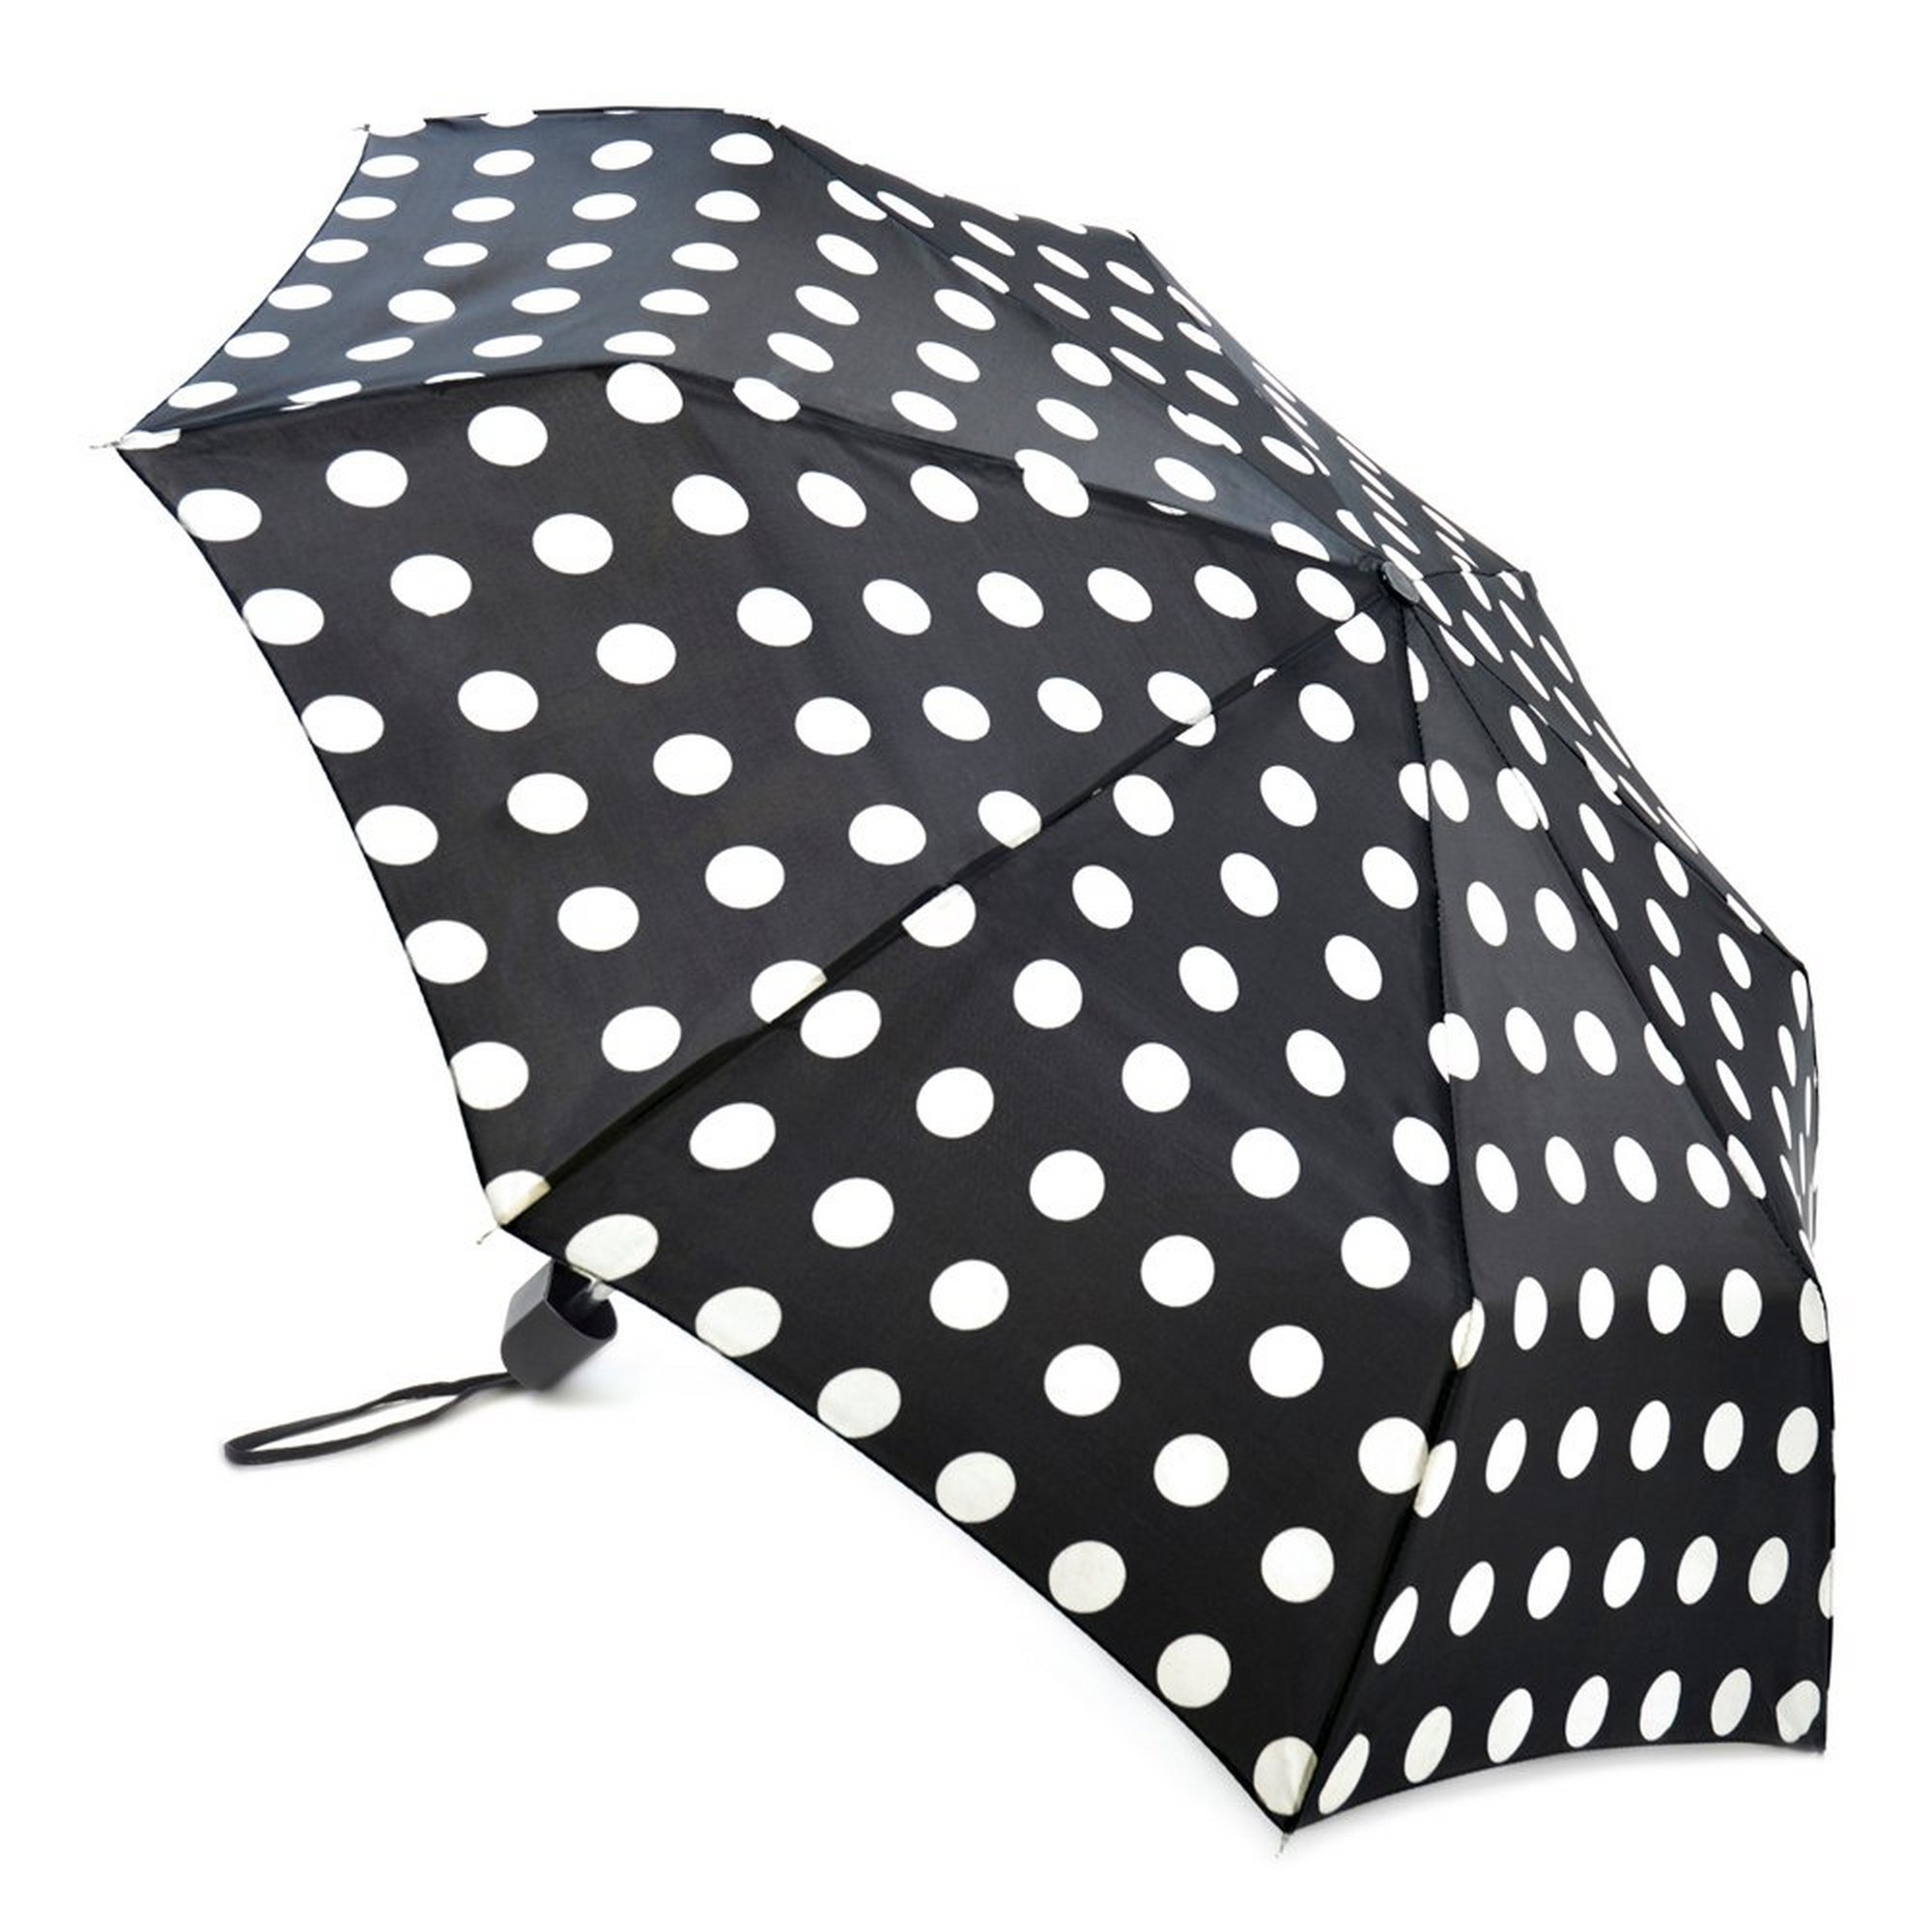 Image of Black Polka Dot Supermini Umbrella